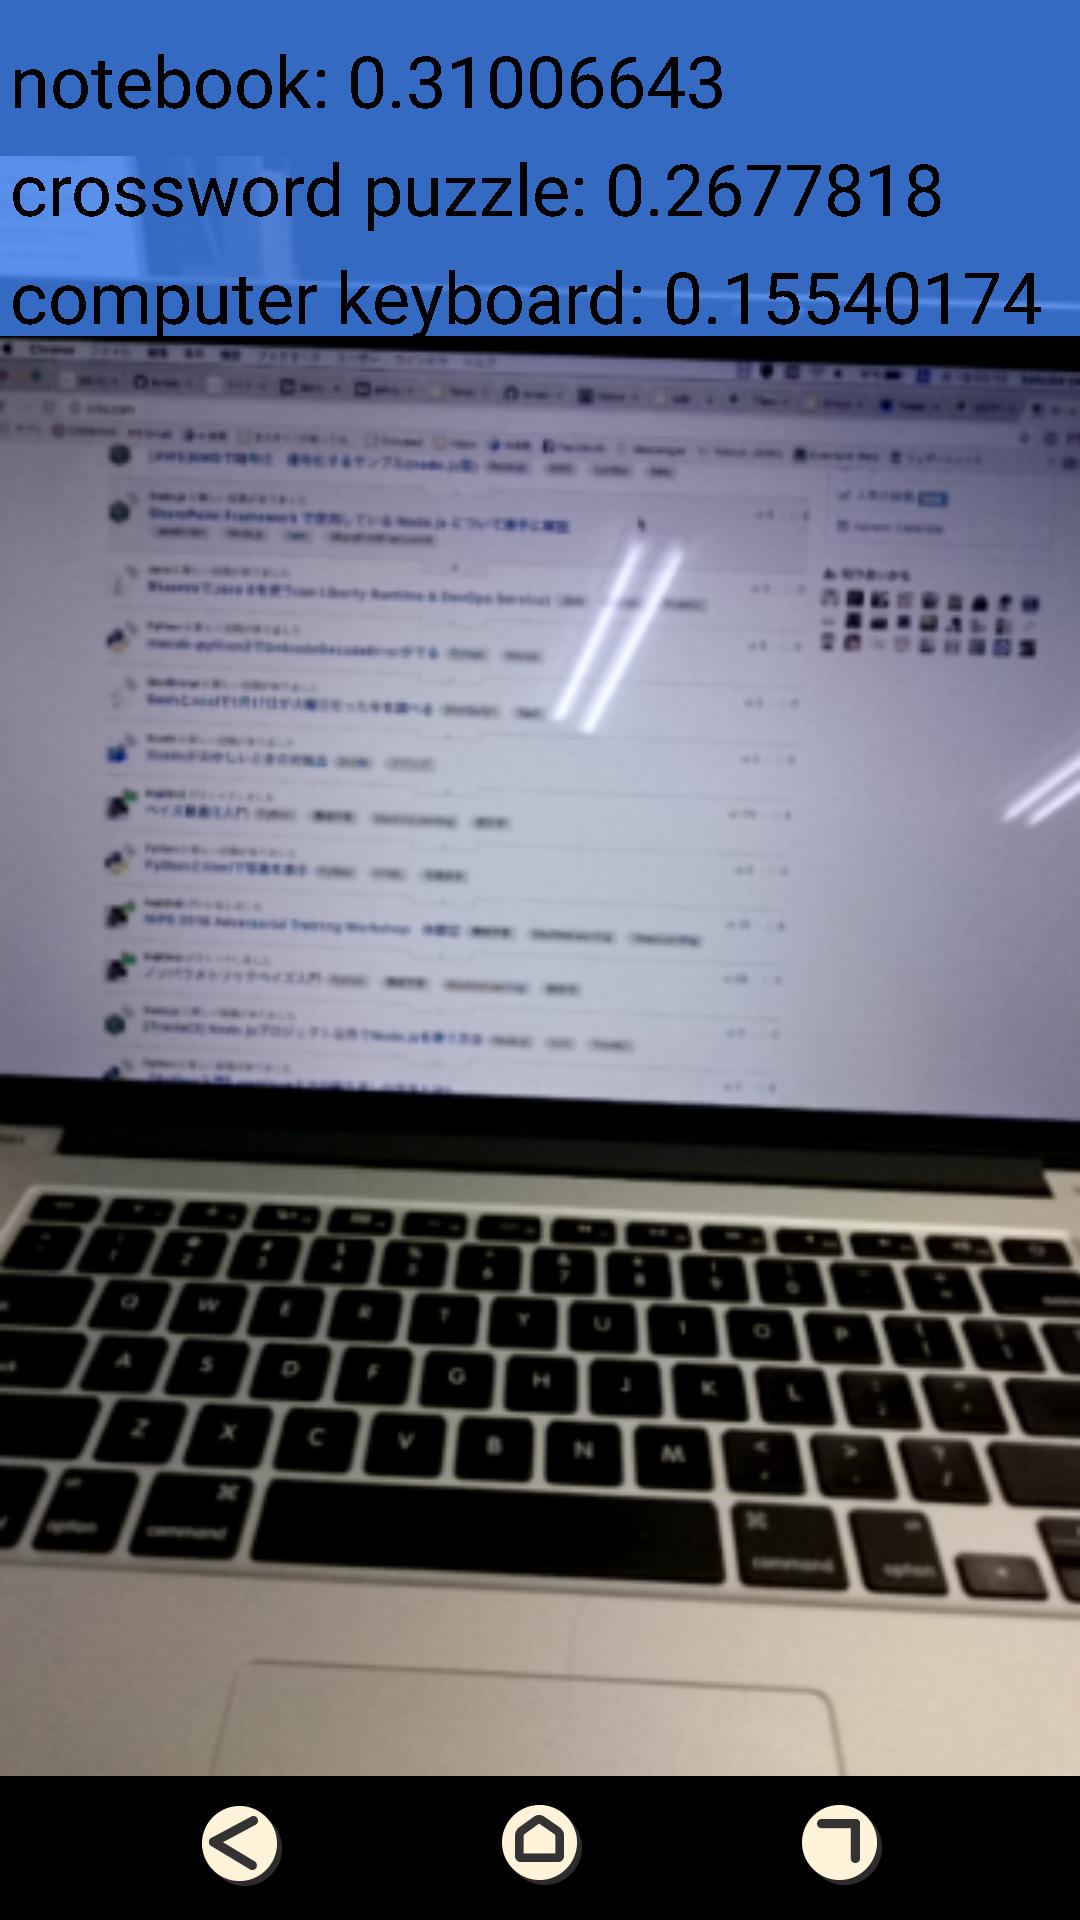 new_screen_shot.png